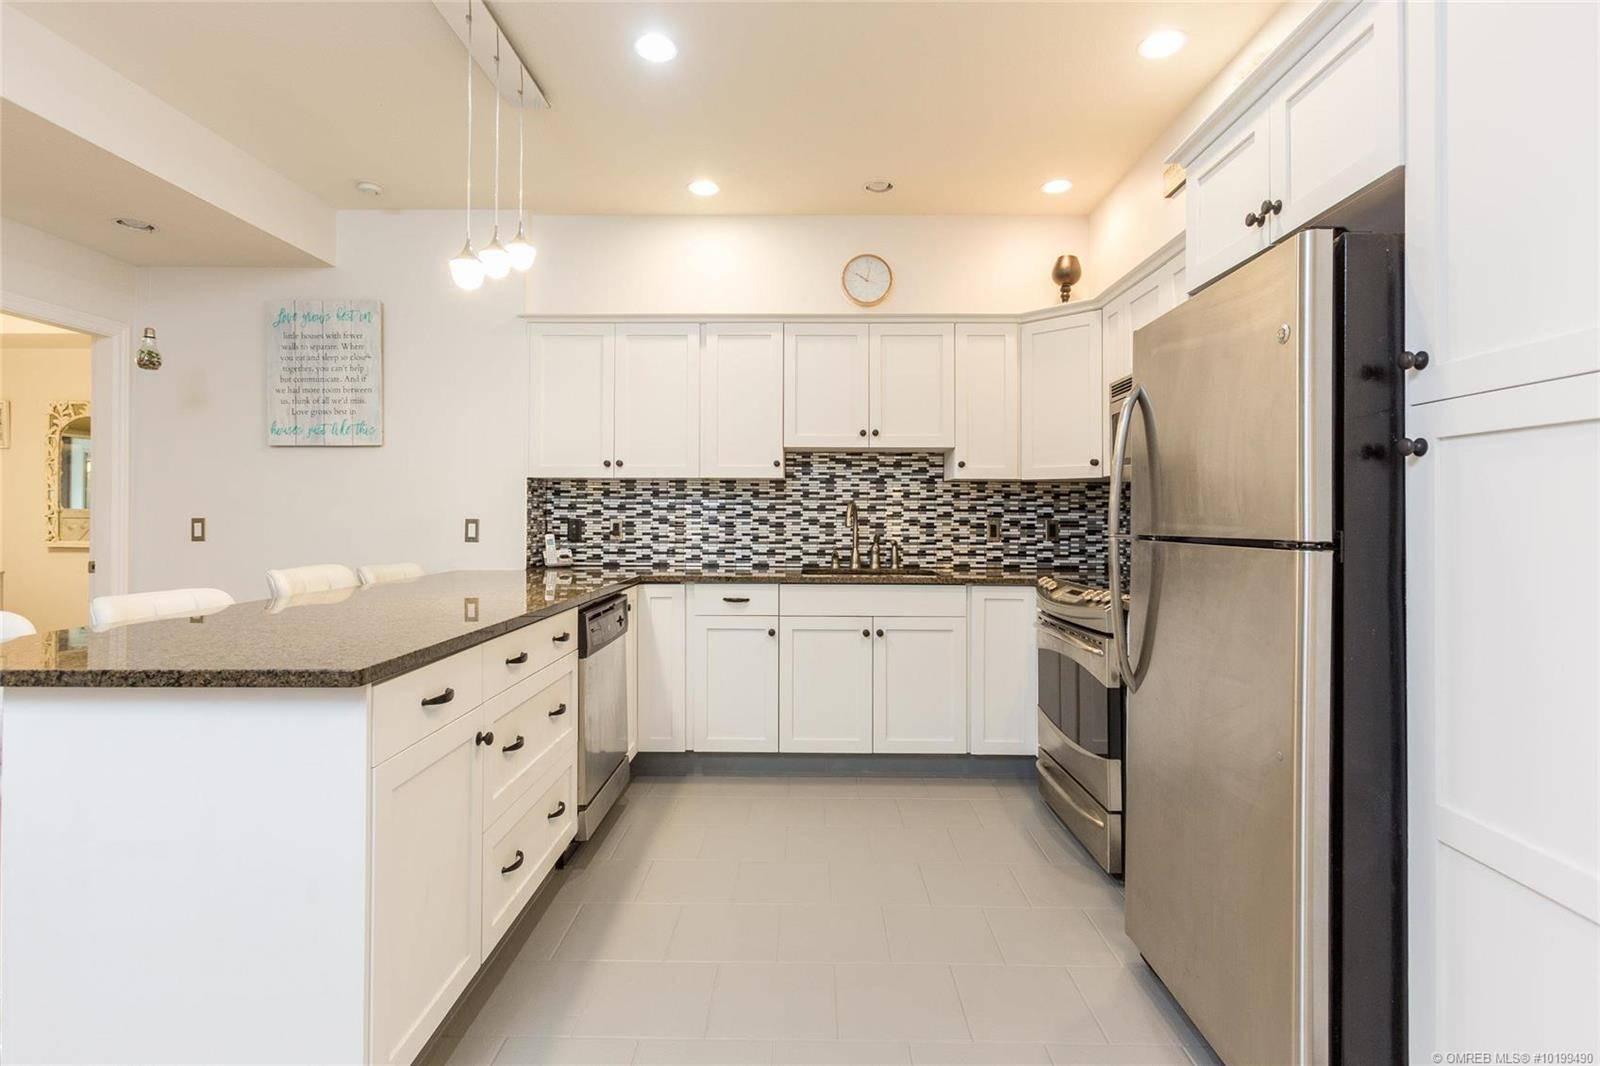 Condo for sale at 3833 Brown Rd Unit 1107 West Kelowna British Columbia - MLS: 10199490